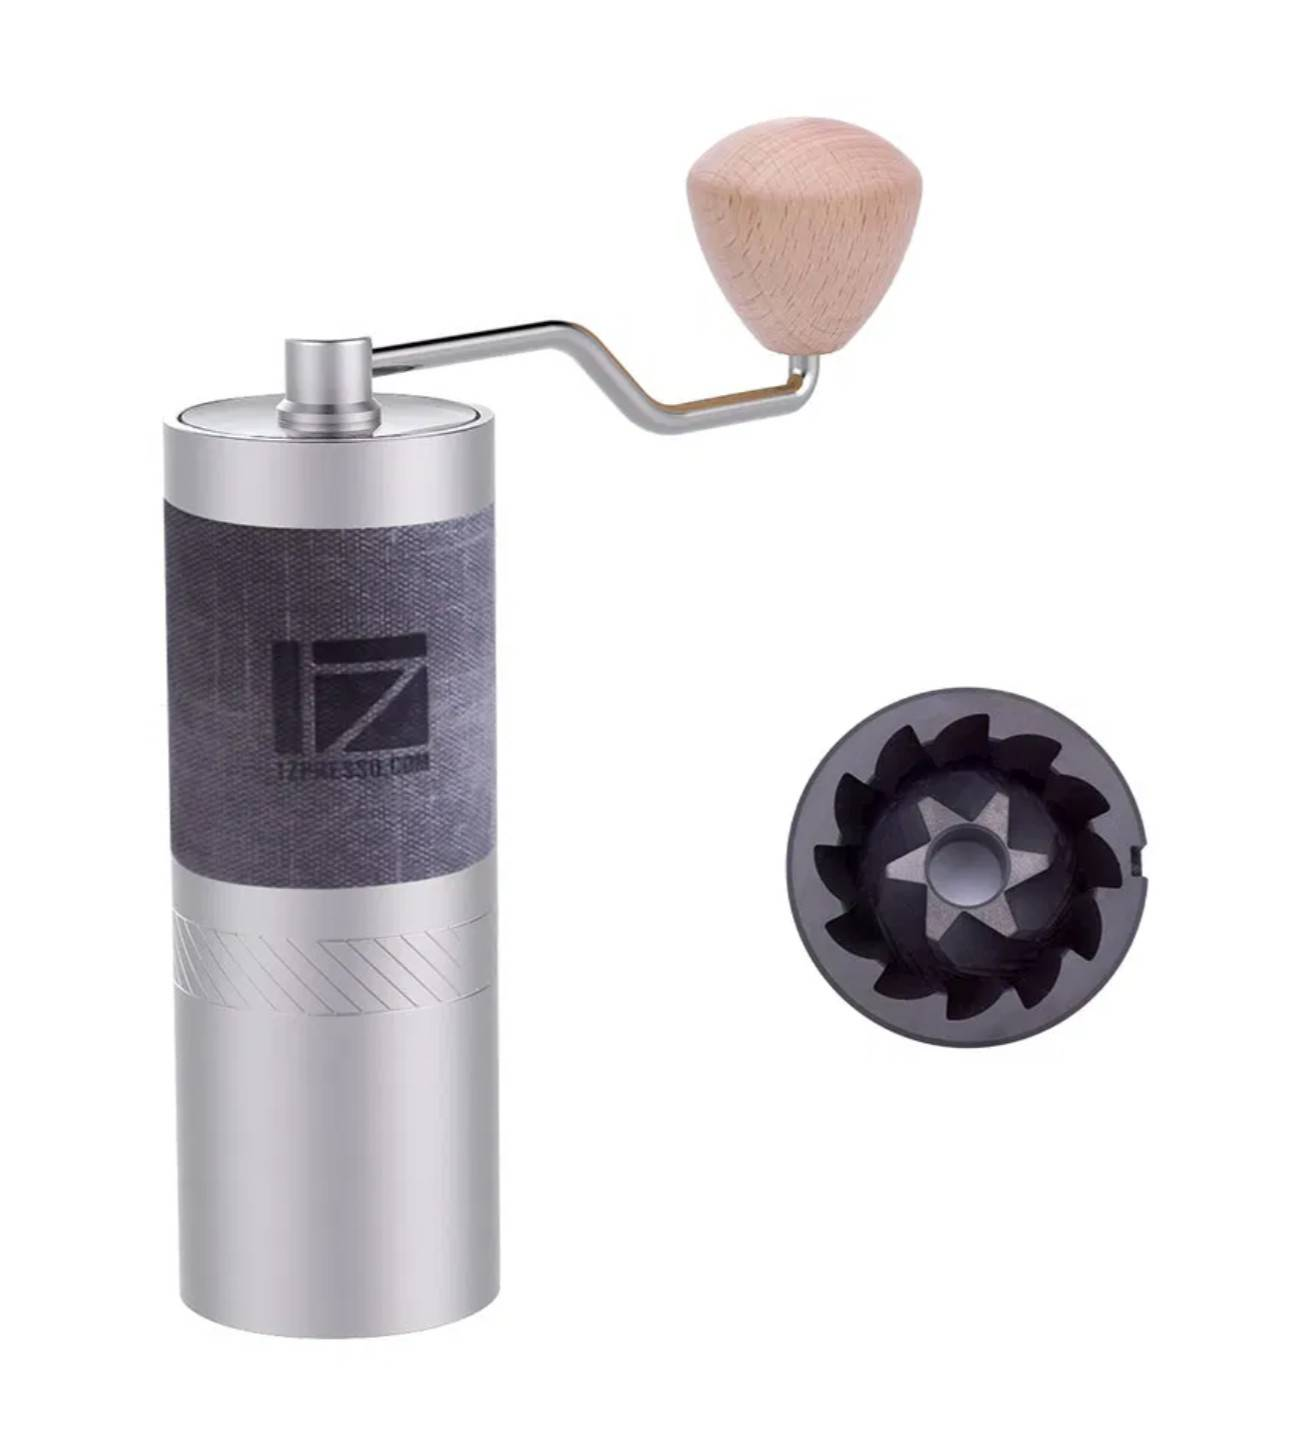 Kaffebox 1Zpresso JE Coffee Grinder